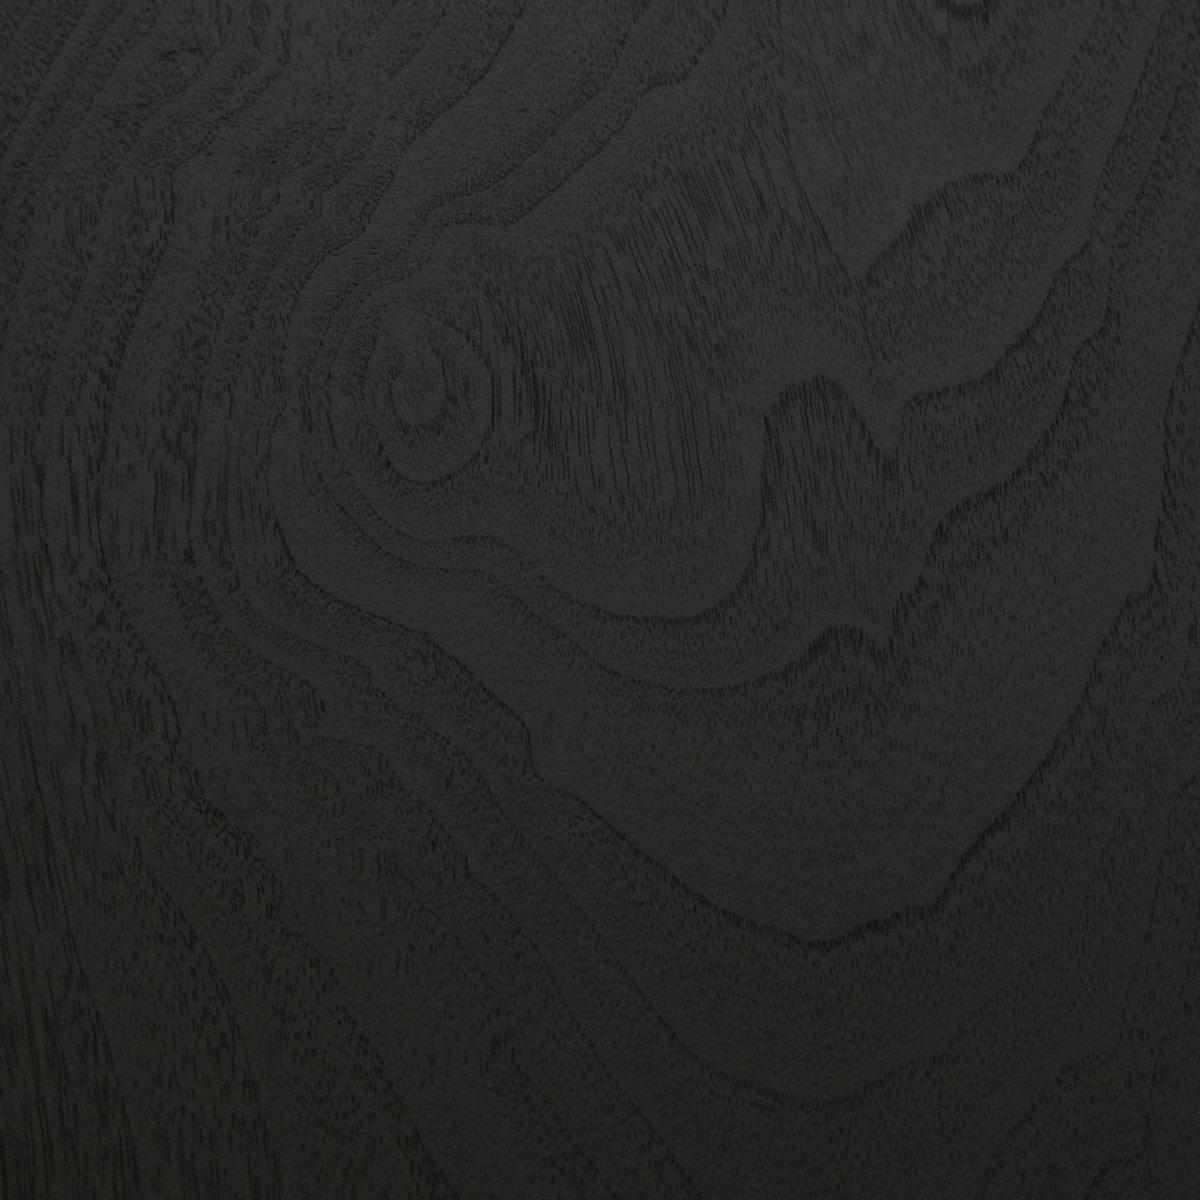 BLACKENED WALNUT